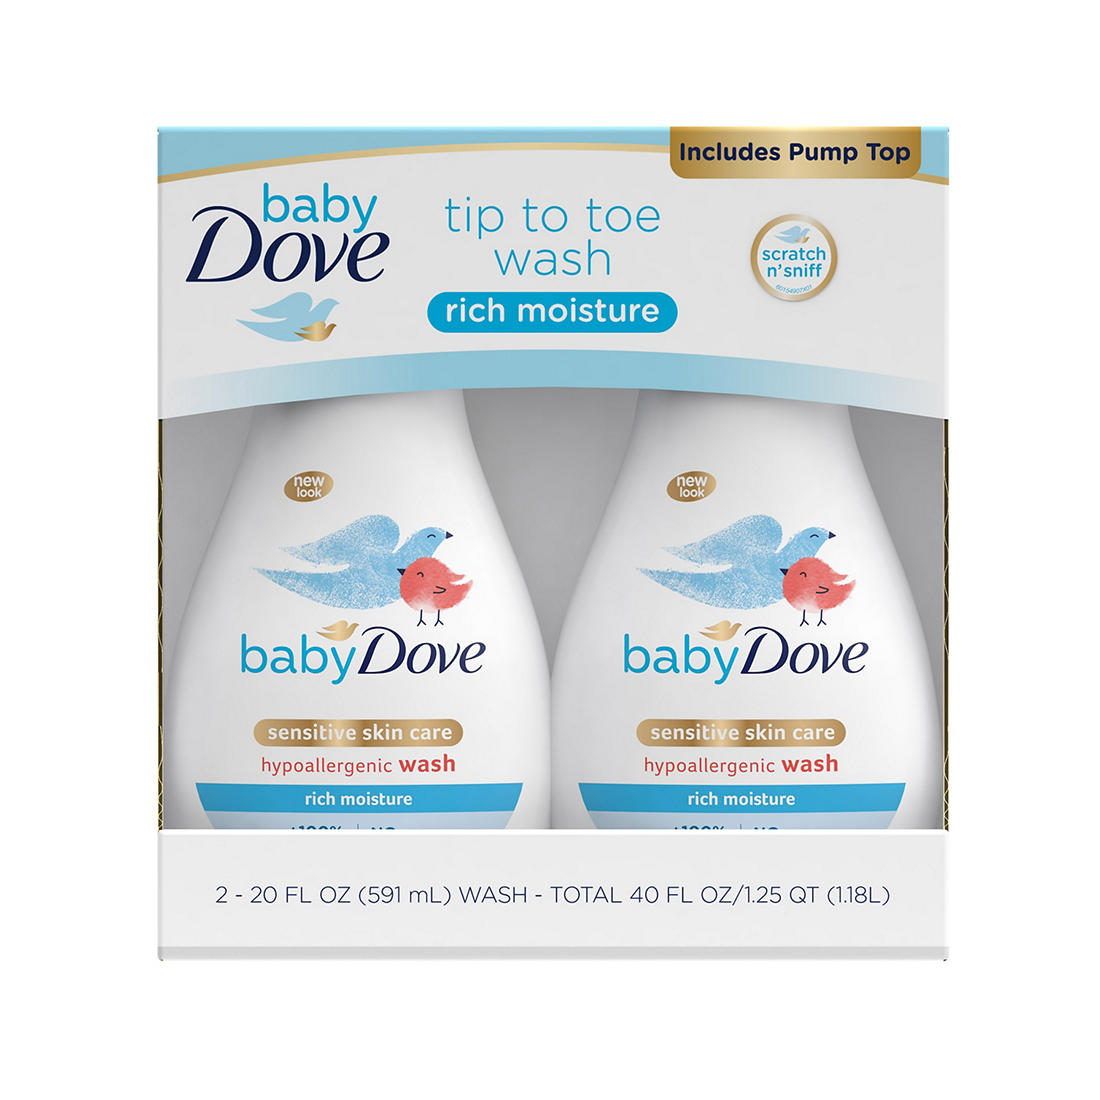 Baby Dove Rich Moisture Tip To Toe Wash Bjs Wholesale Club